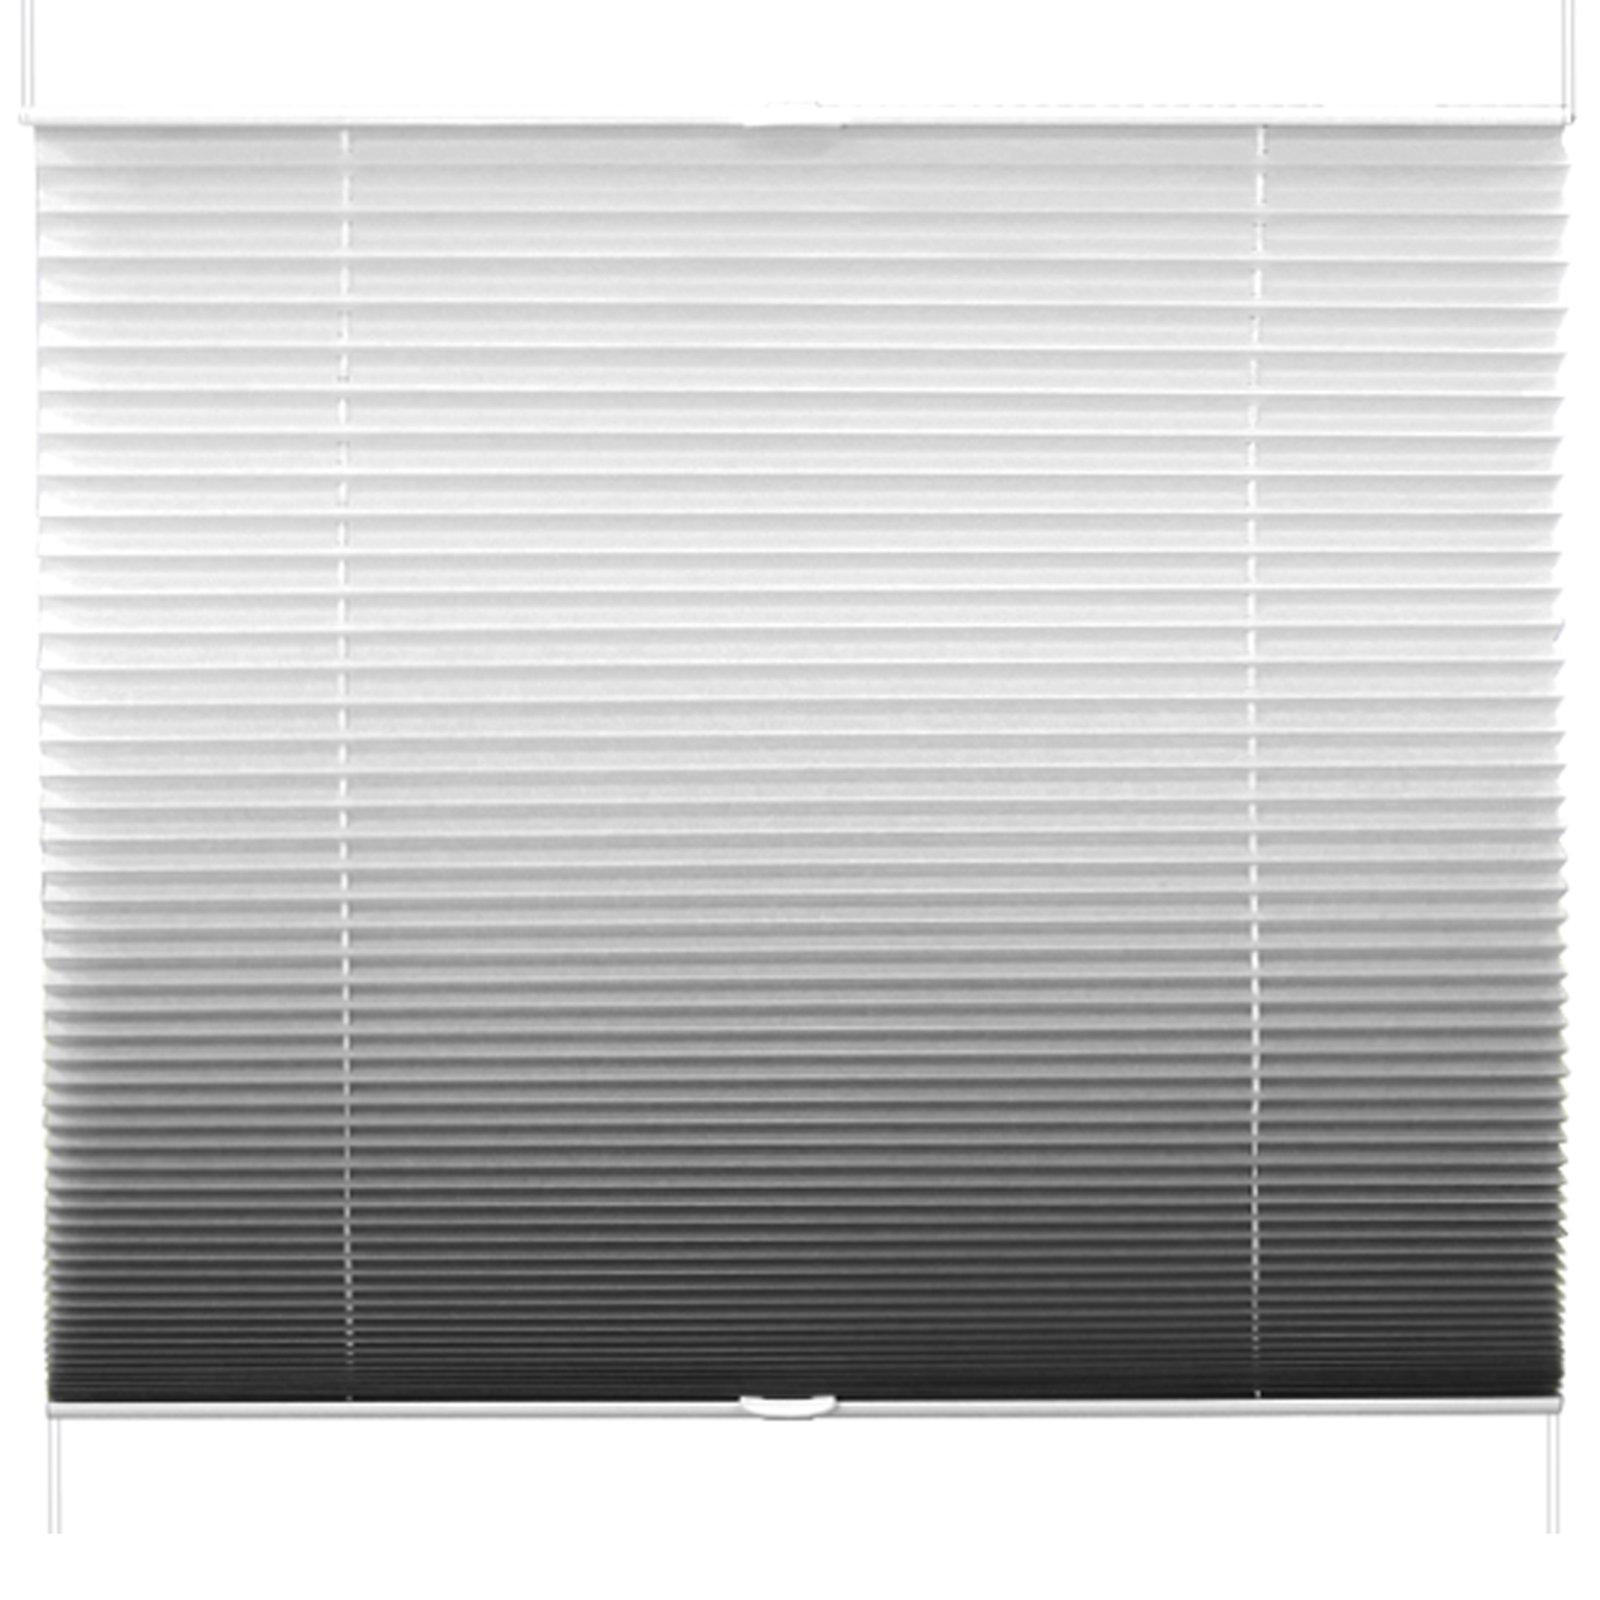 plissee anthrazit farbverlauf 105x130 cm plissees rollos jalousien deko haushalt. Black Bedroom Furniture Sets. Home Design Ideas